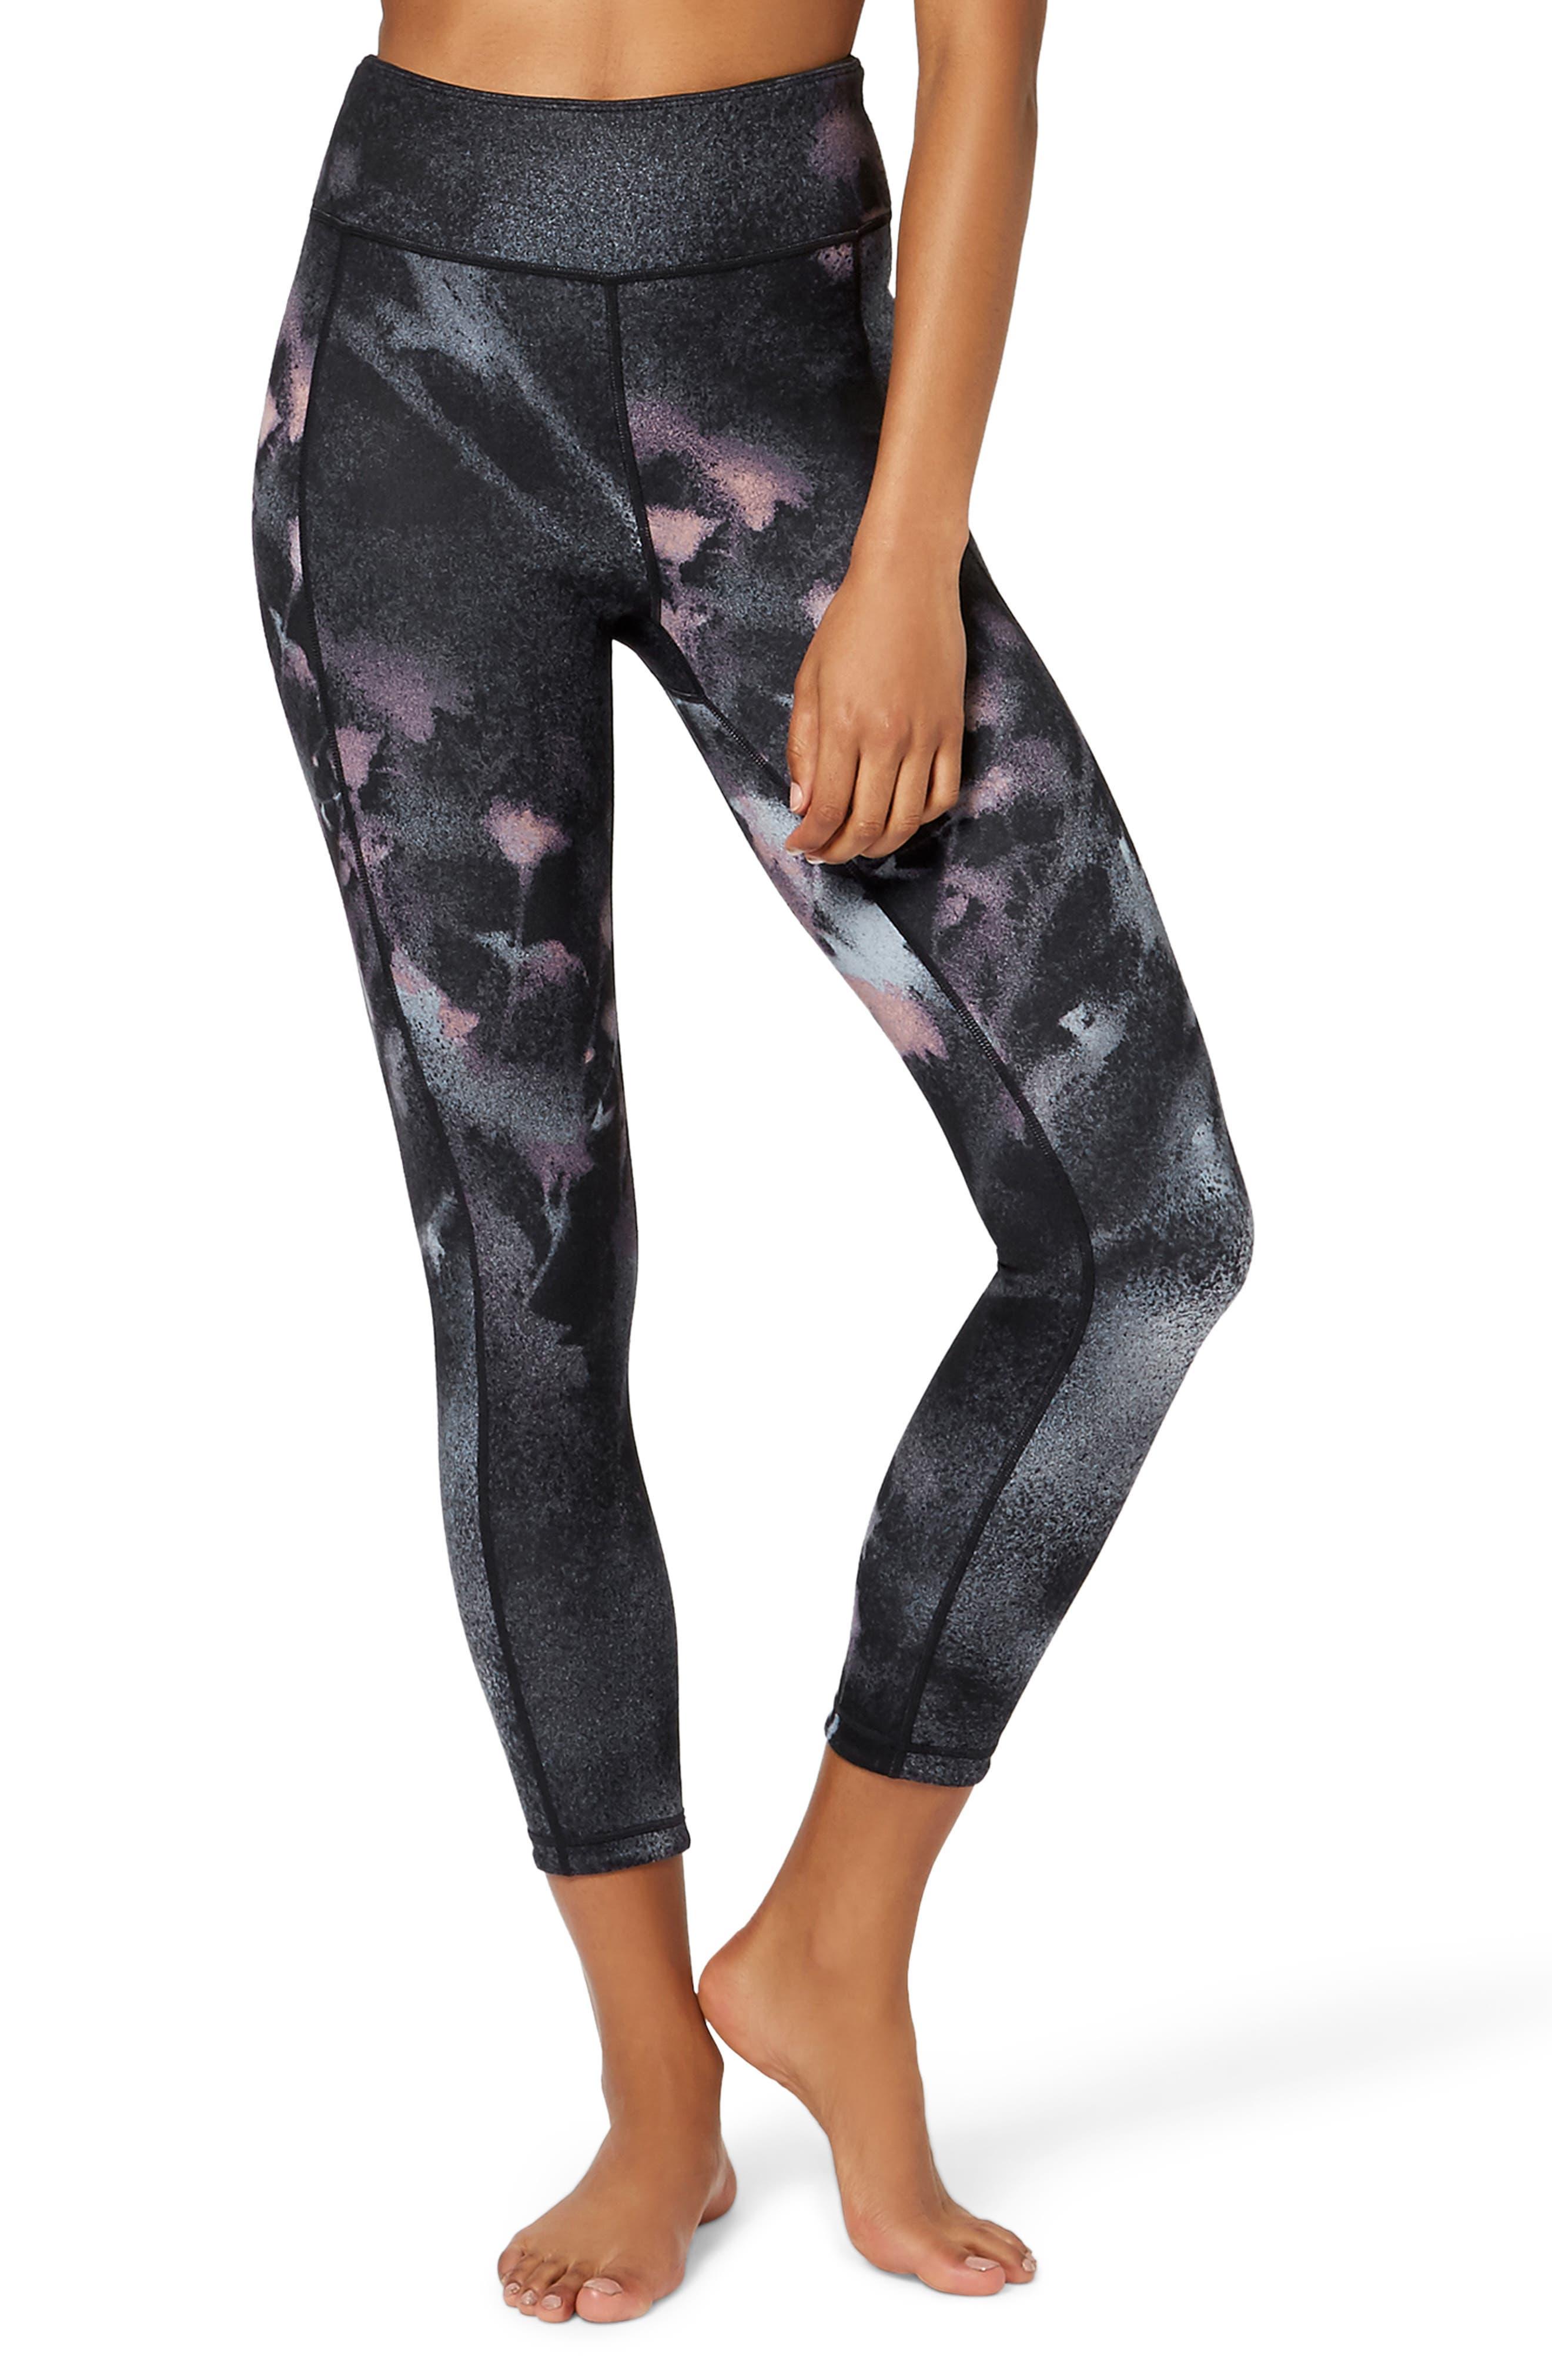 Double Duty Reversible Yoga Leggings,                             Main thumbnail 1, color,                             BLACK SPRAY PAINT FLORAL